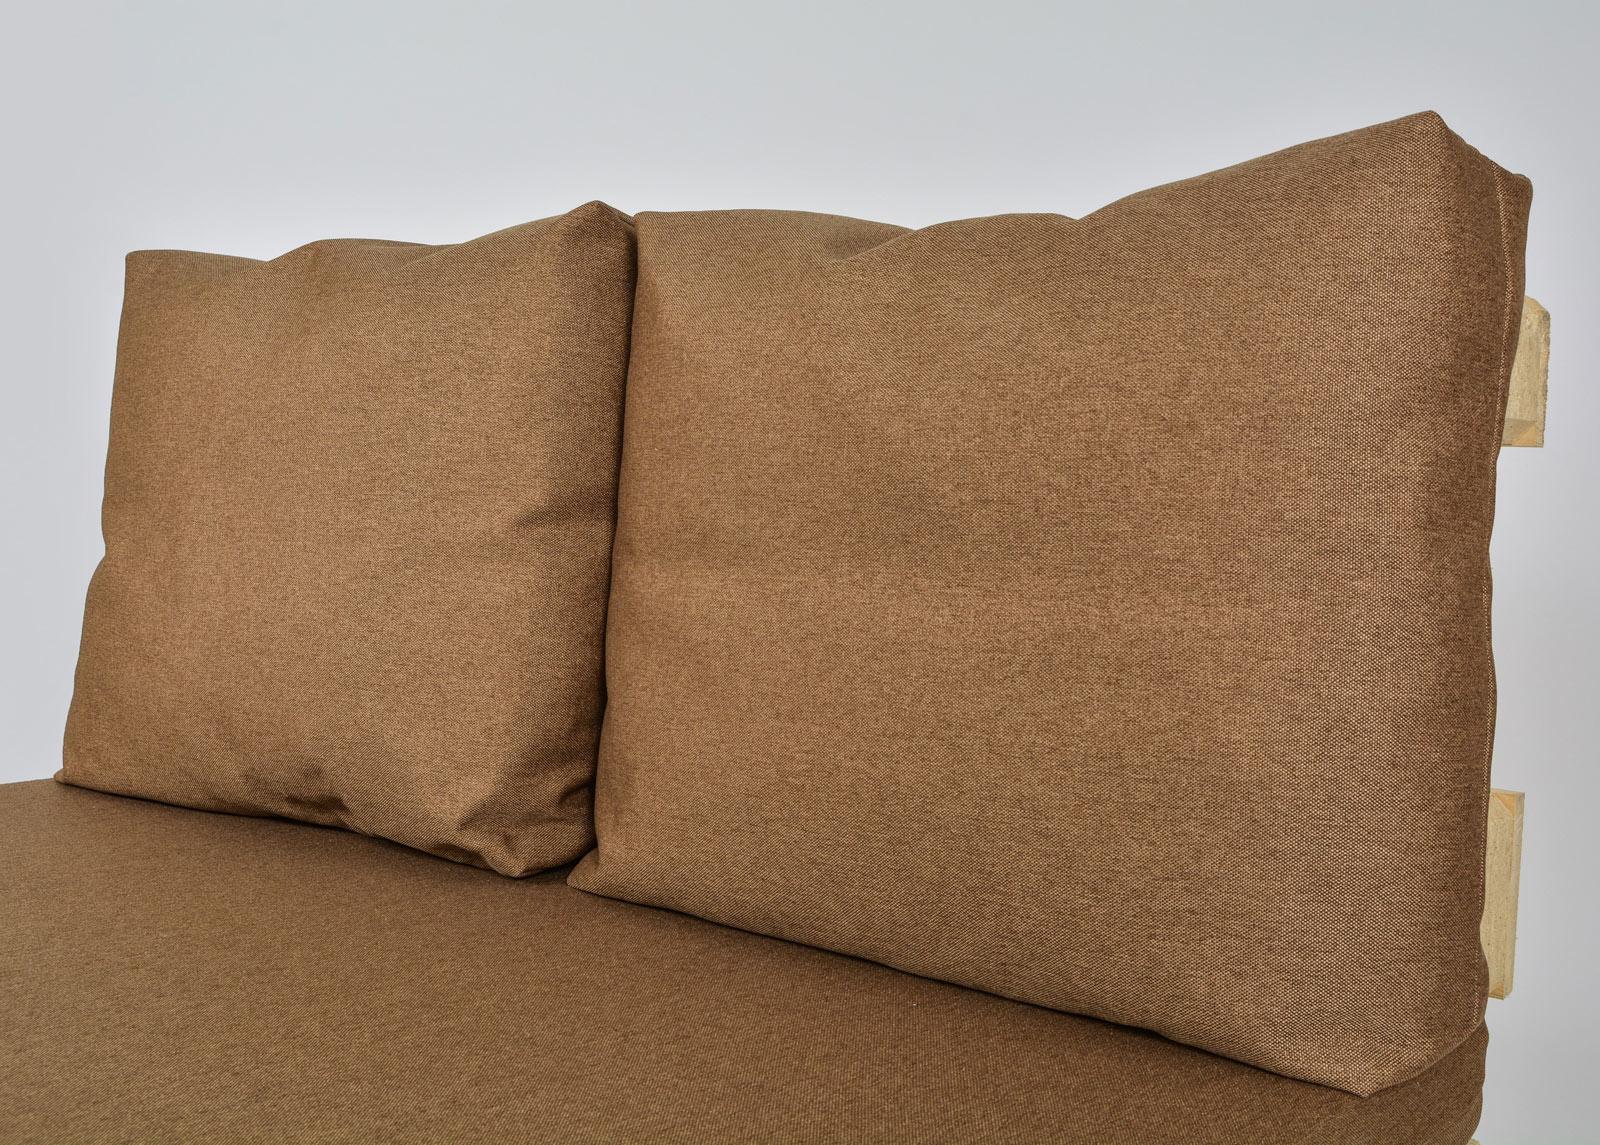 Lavapehmuste Style 60x50 cm, 2 kpl